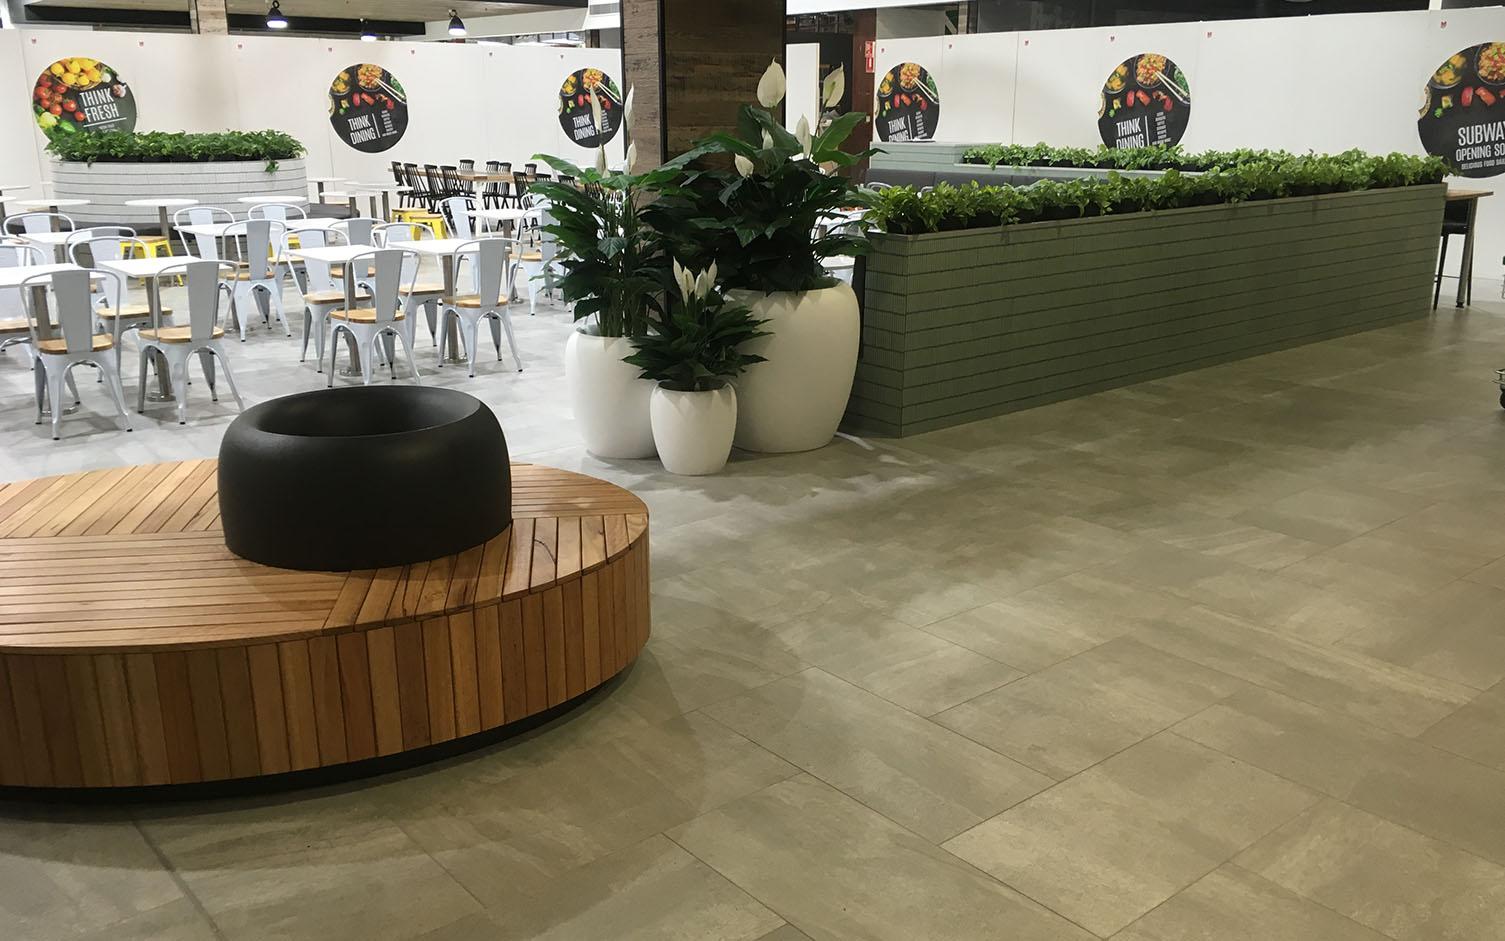 https://ggtiling.com.au/wp-content/uploads/2018/11/G-and-G-Tiling-Golden-Grove-Shopping-Centre_0018_19.jpg